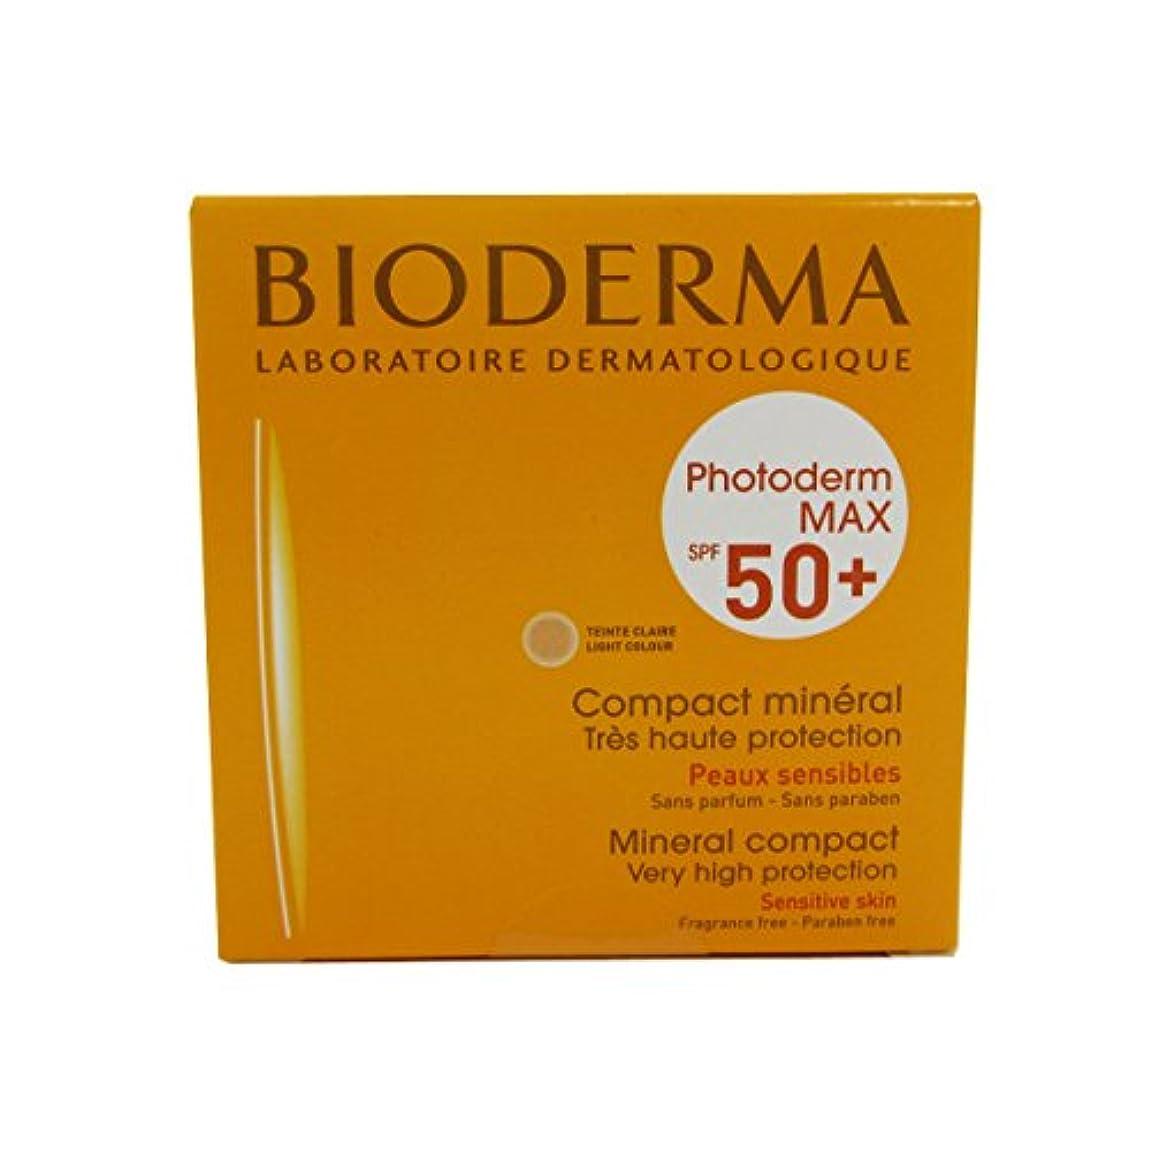 終点損失伝統Bioderma Photoderm Max Compact Mineral 50+ Light 10g [並行輸入品]